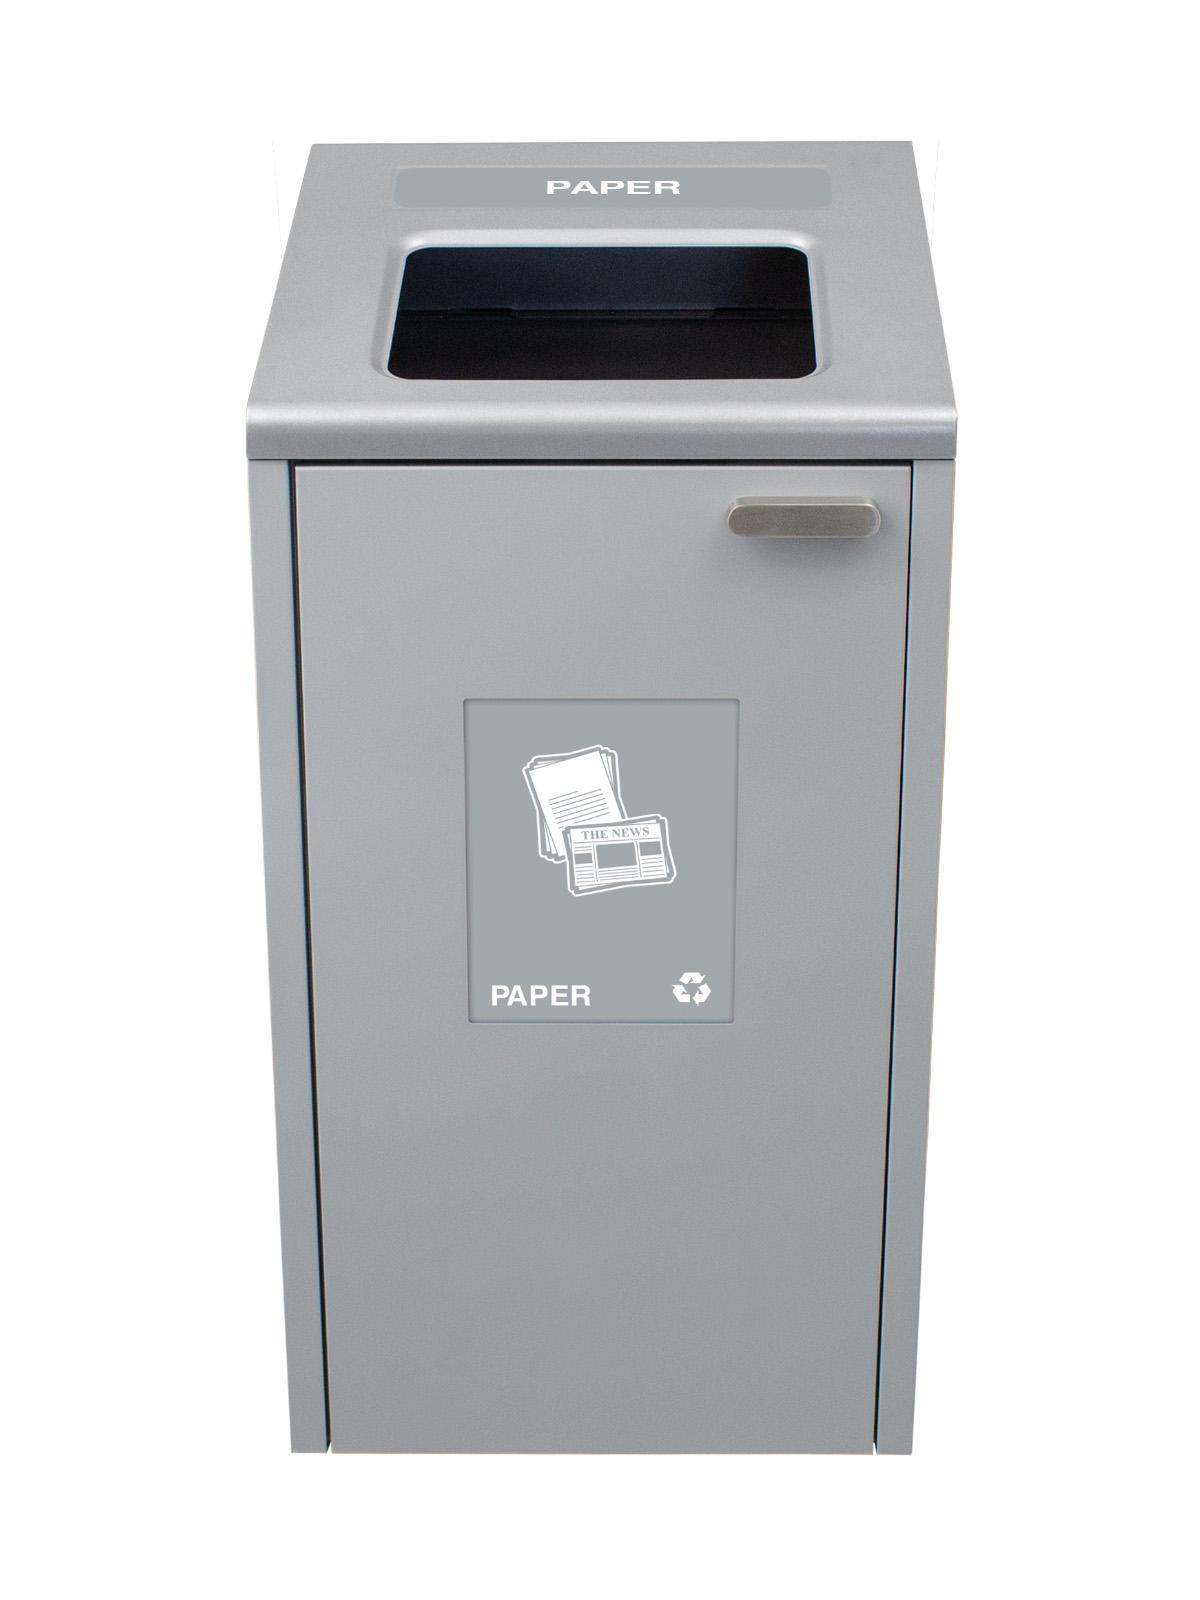 IKONA - Single - Paper - Full - Grey-Silver